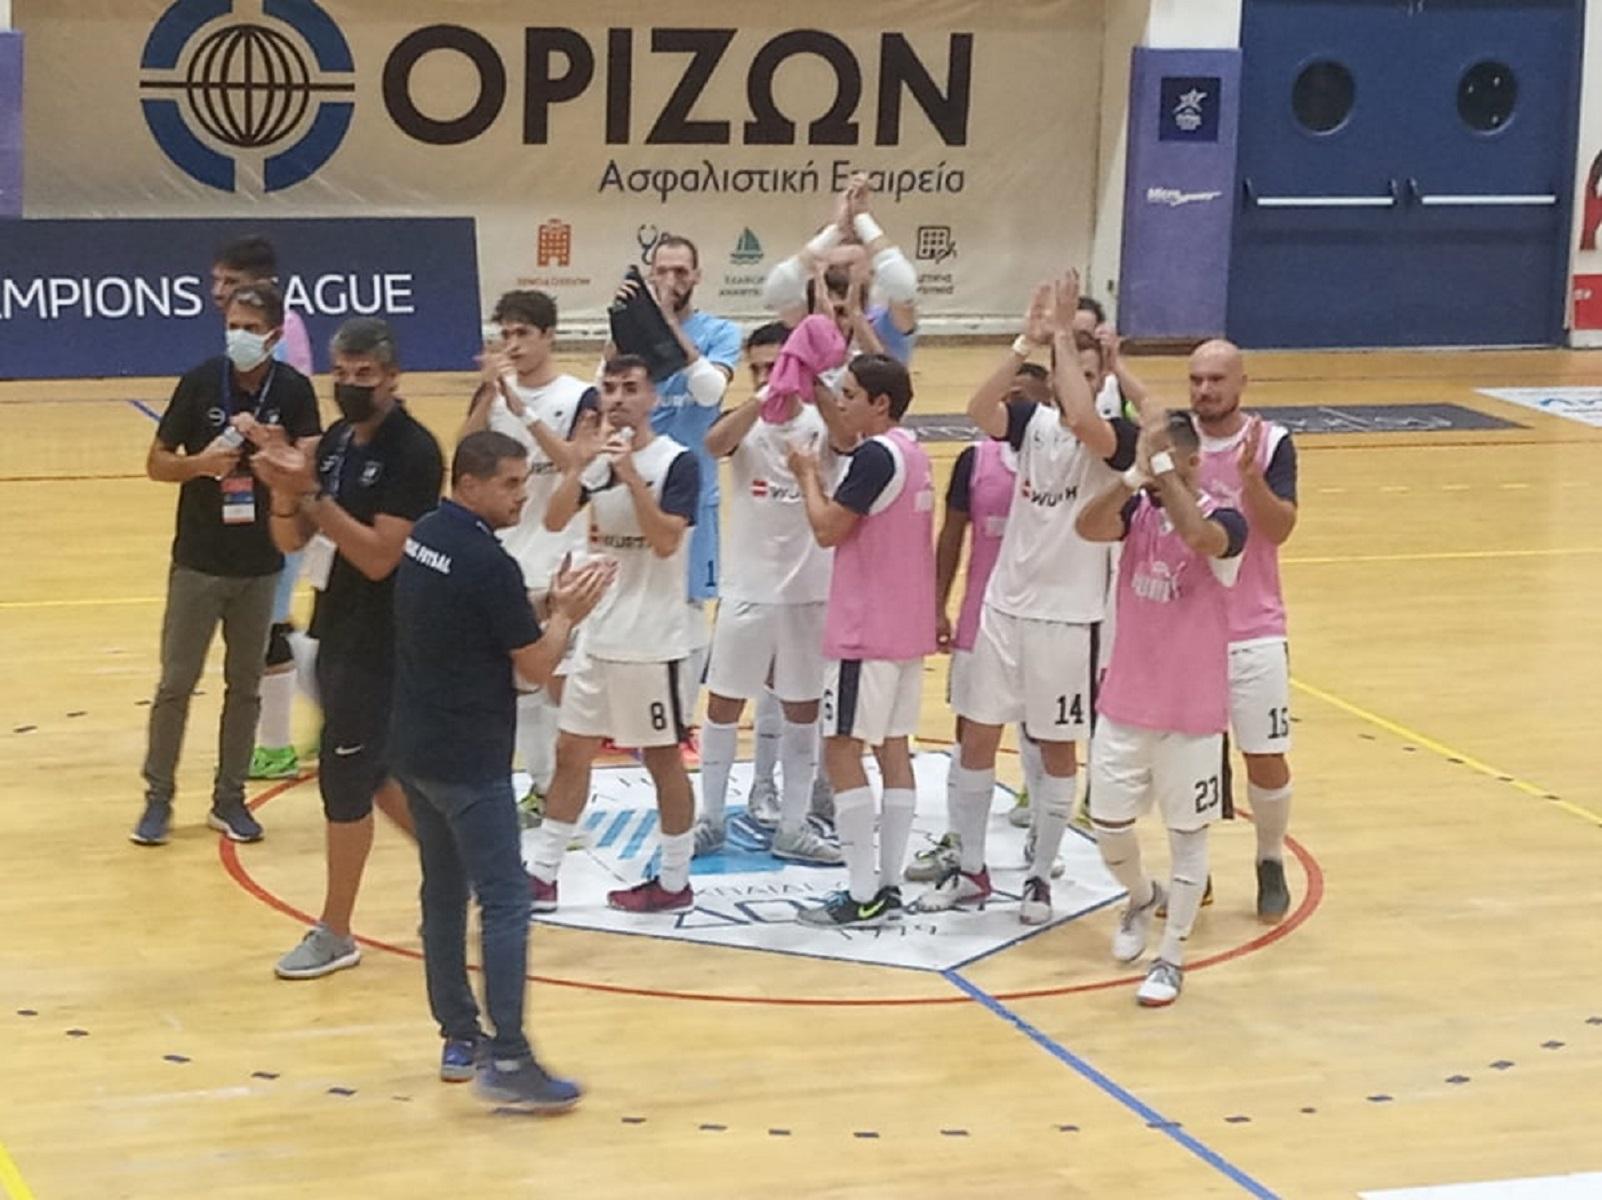 Futsal Champions League: «Χ»αμένη ευκαιρία για τον Δούκα στην πρεμιέρα – «Μάγεψε» ο Σαβιόλα για την Eνκάμπ